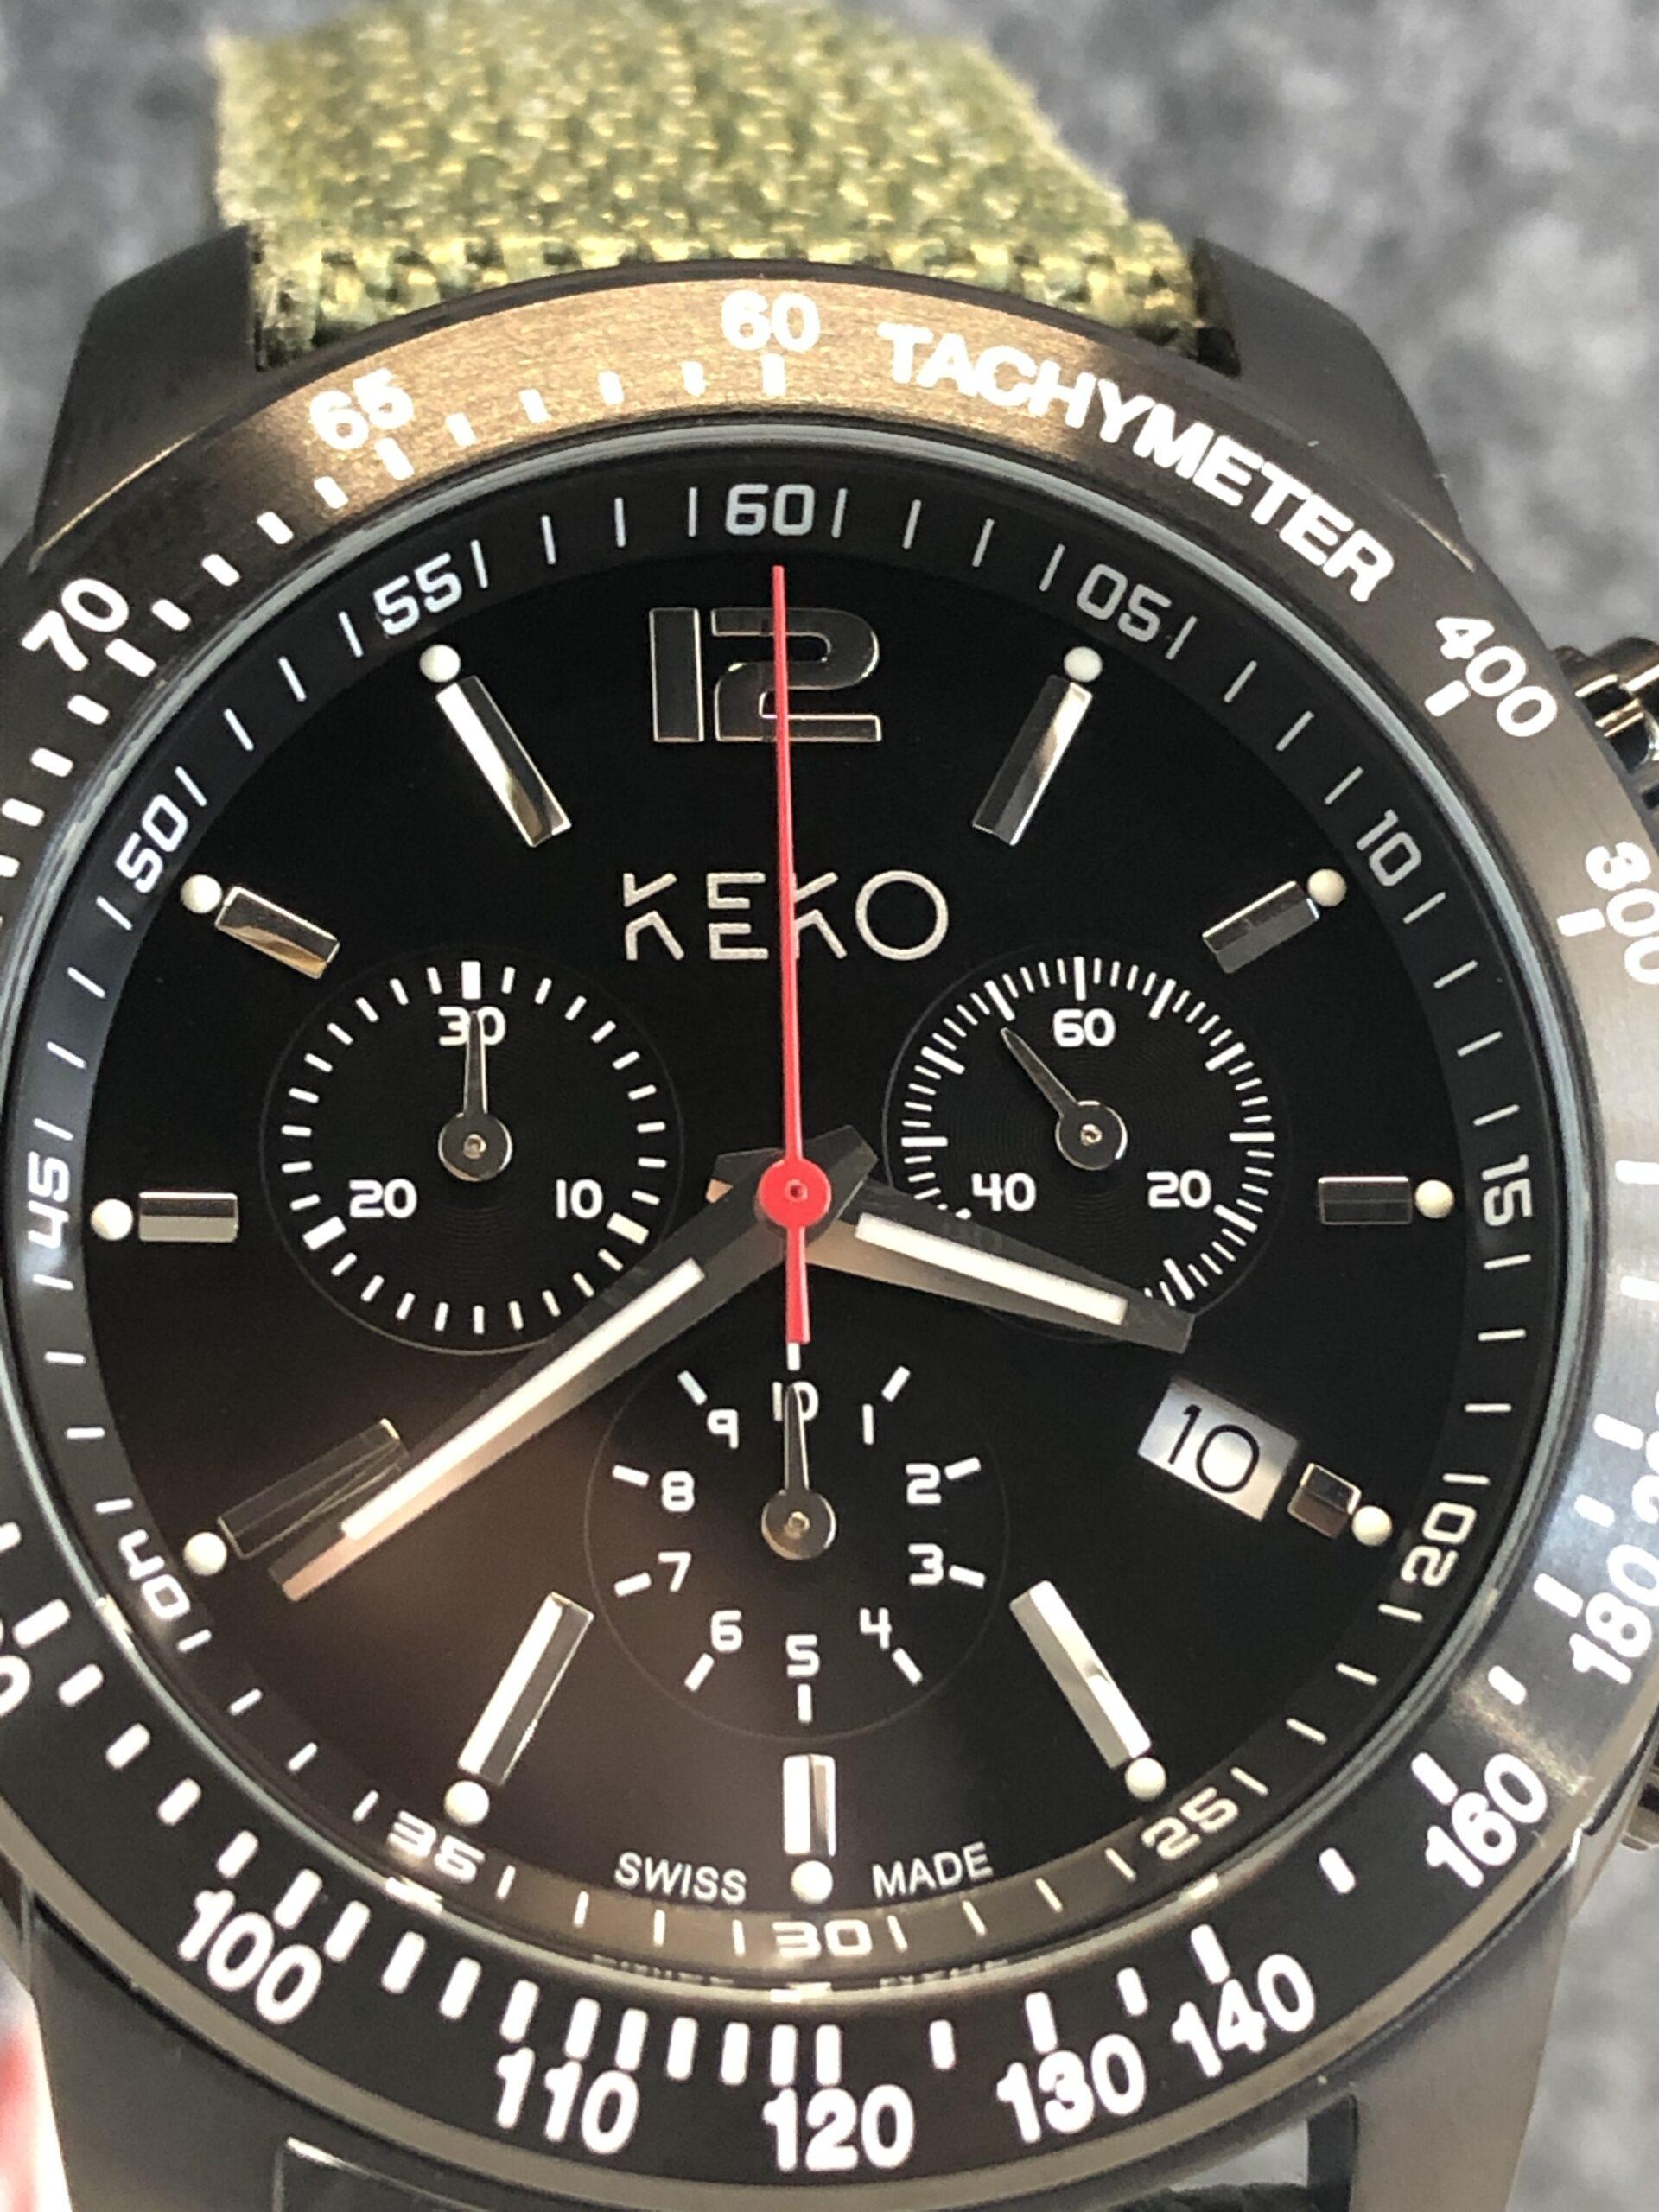 keko-chronograph-outdoor-adventure-mit-grünem-nylon-armband-frontansicht